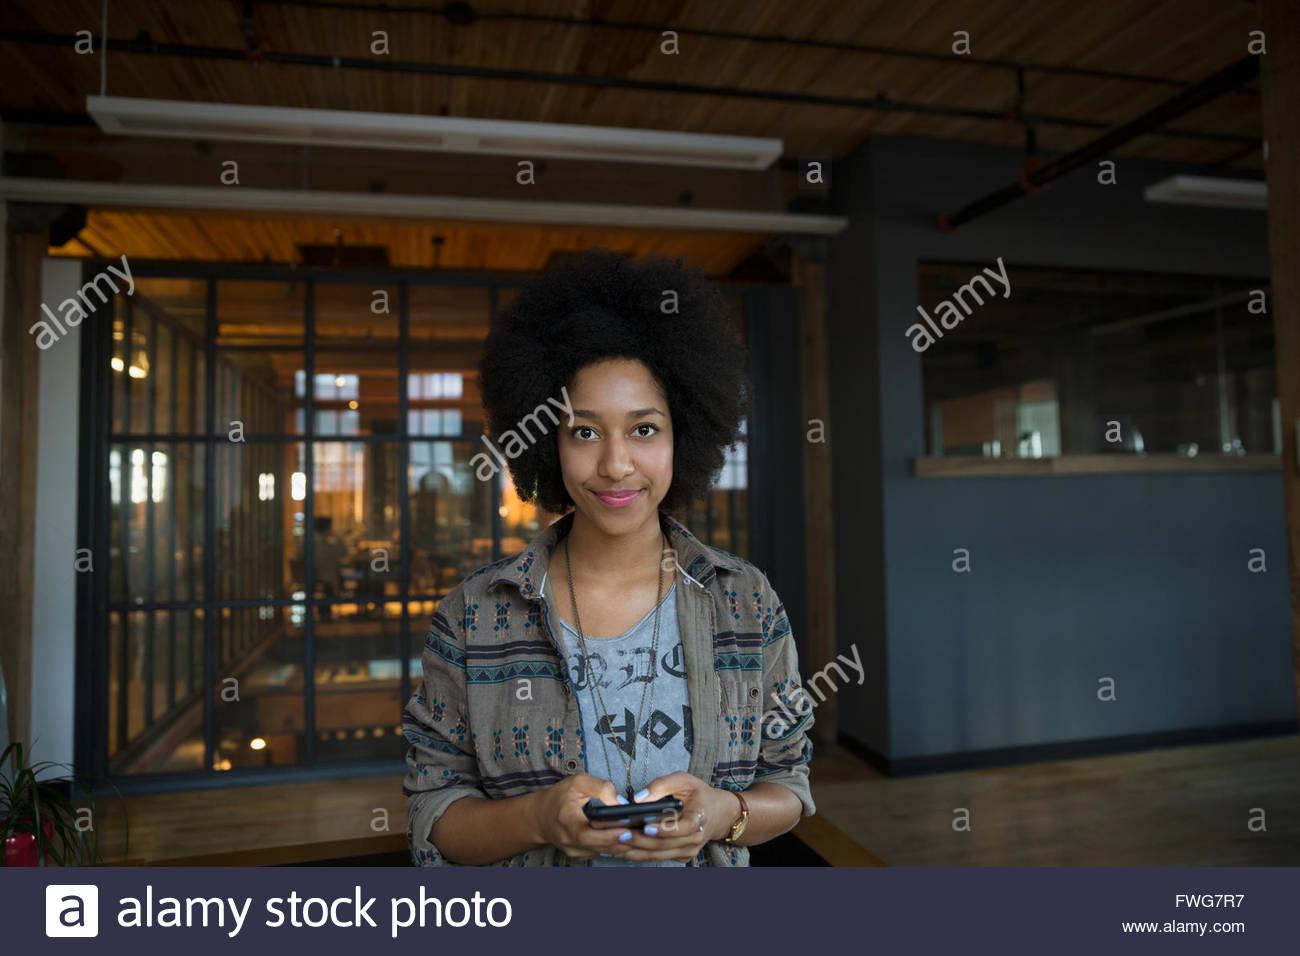 Portrait woman texting Photo Stock